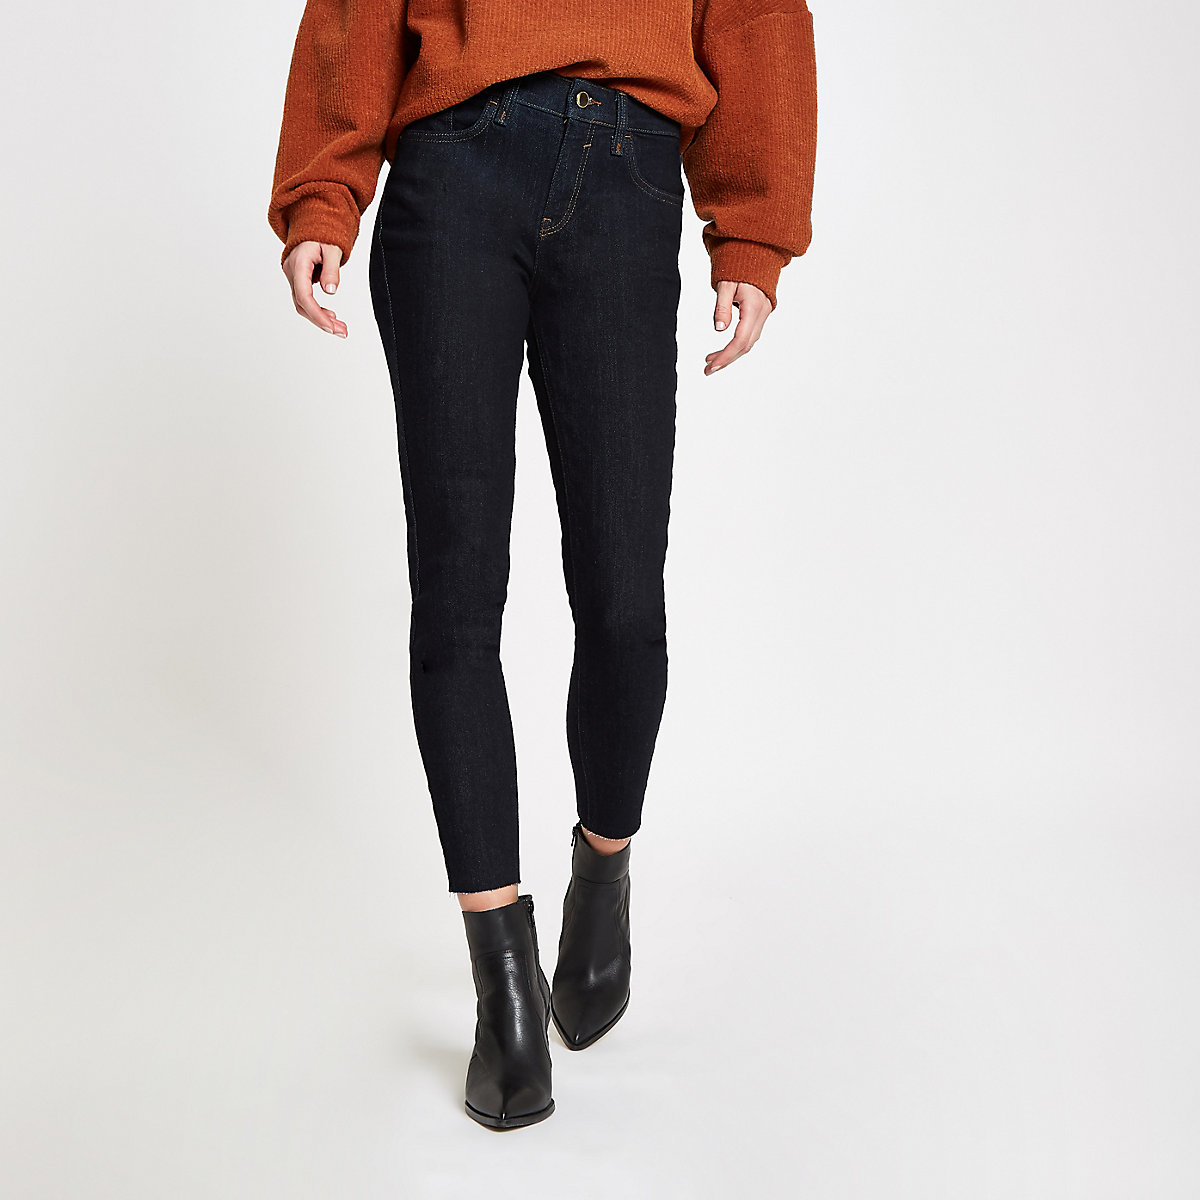 Amelie – Dunkelblaue Super Skinny Jeans mit offenem Saum